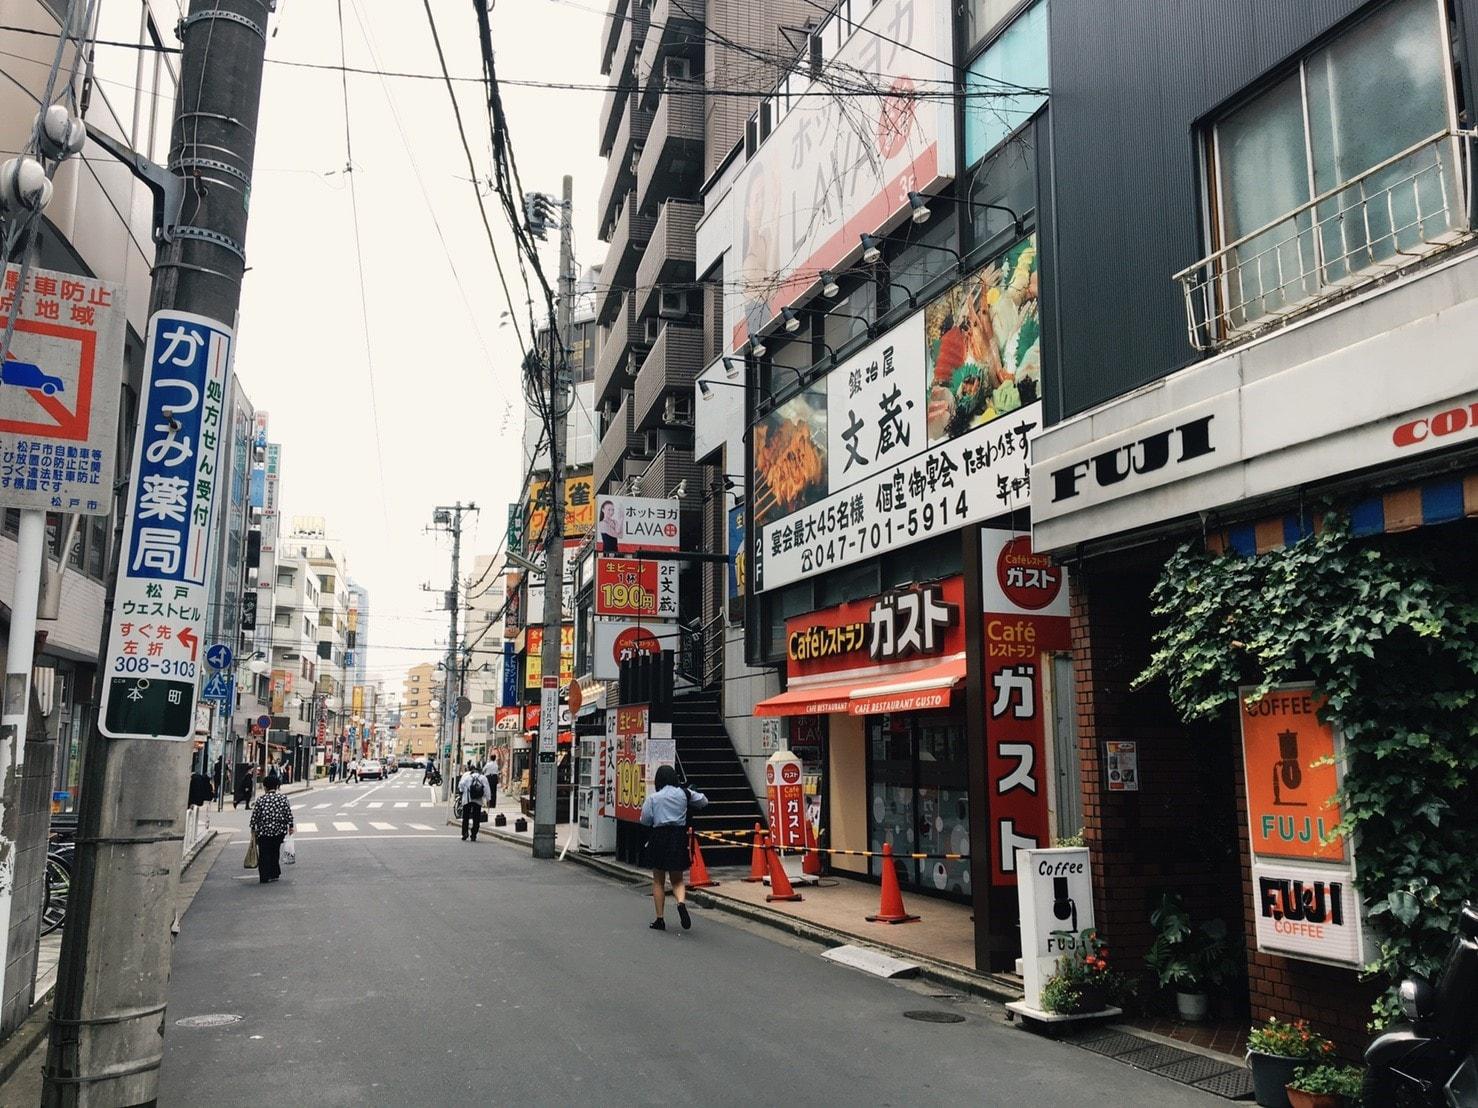 松戸駅 飲み屋街